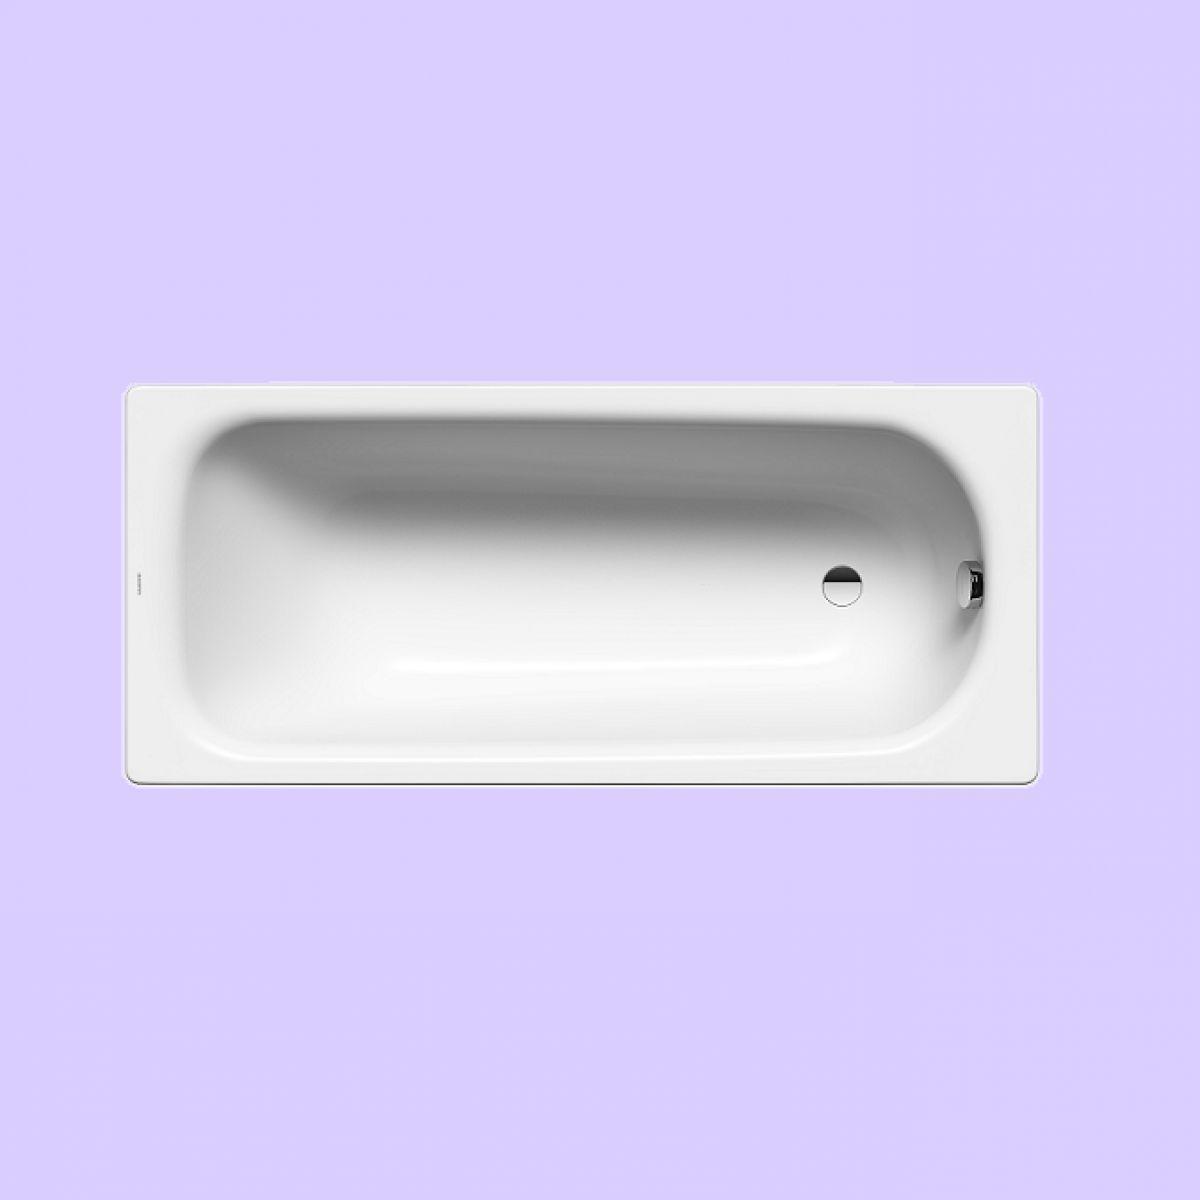 Kaldewei Saniform Plus Steel Bath - 111820000001